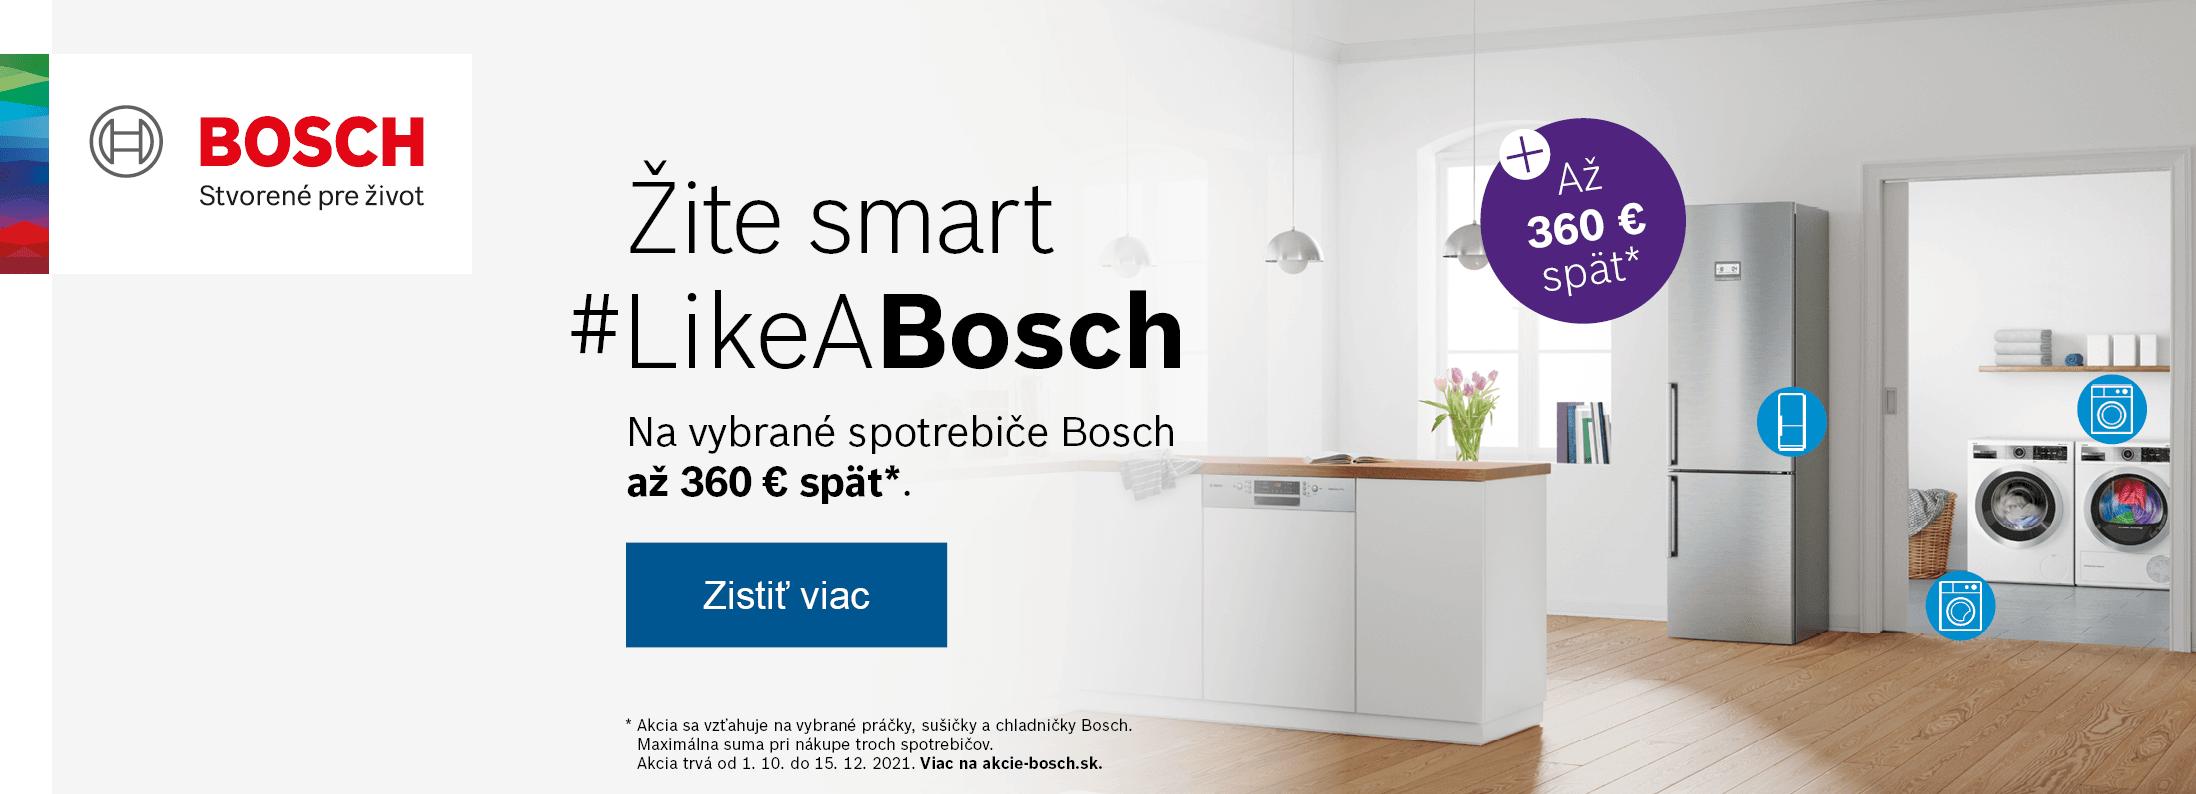 Bosch - Žite smart #LikeABosch